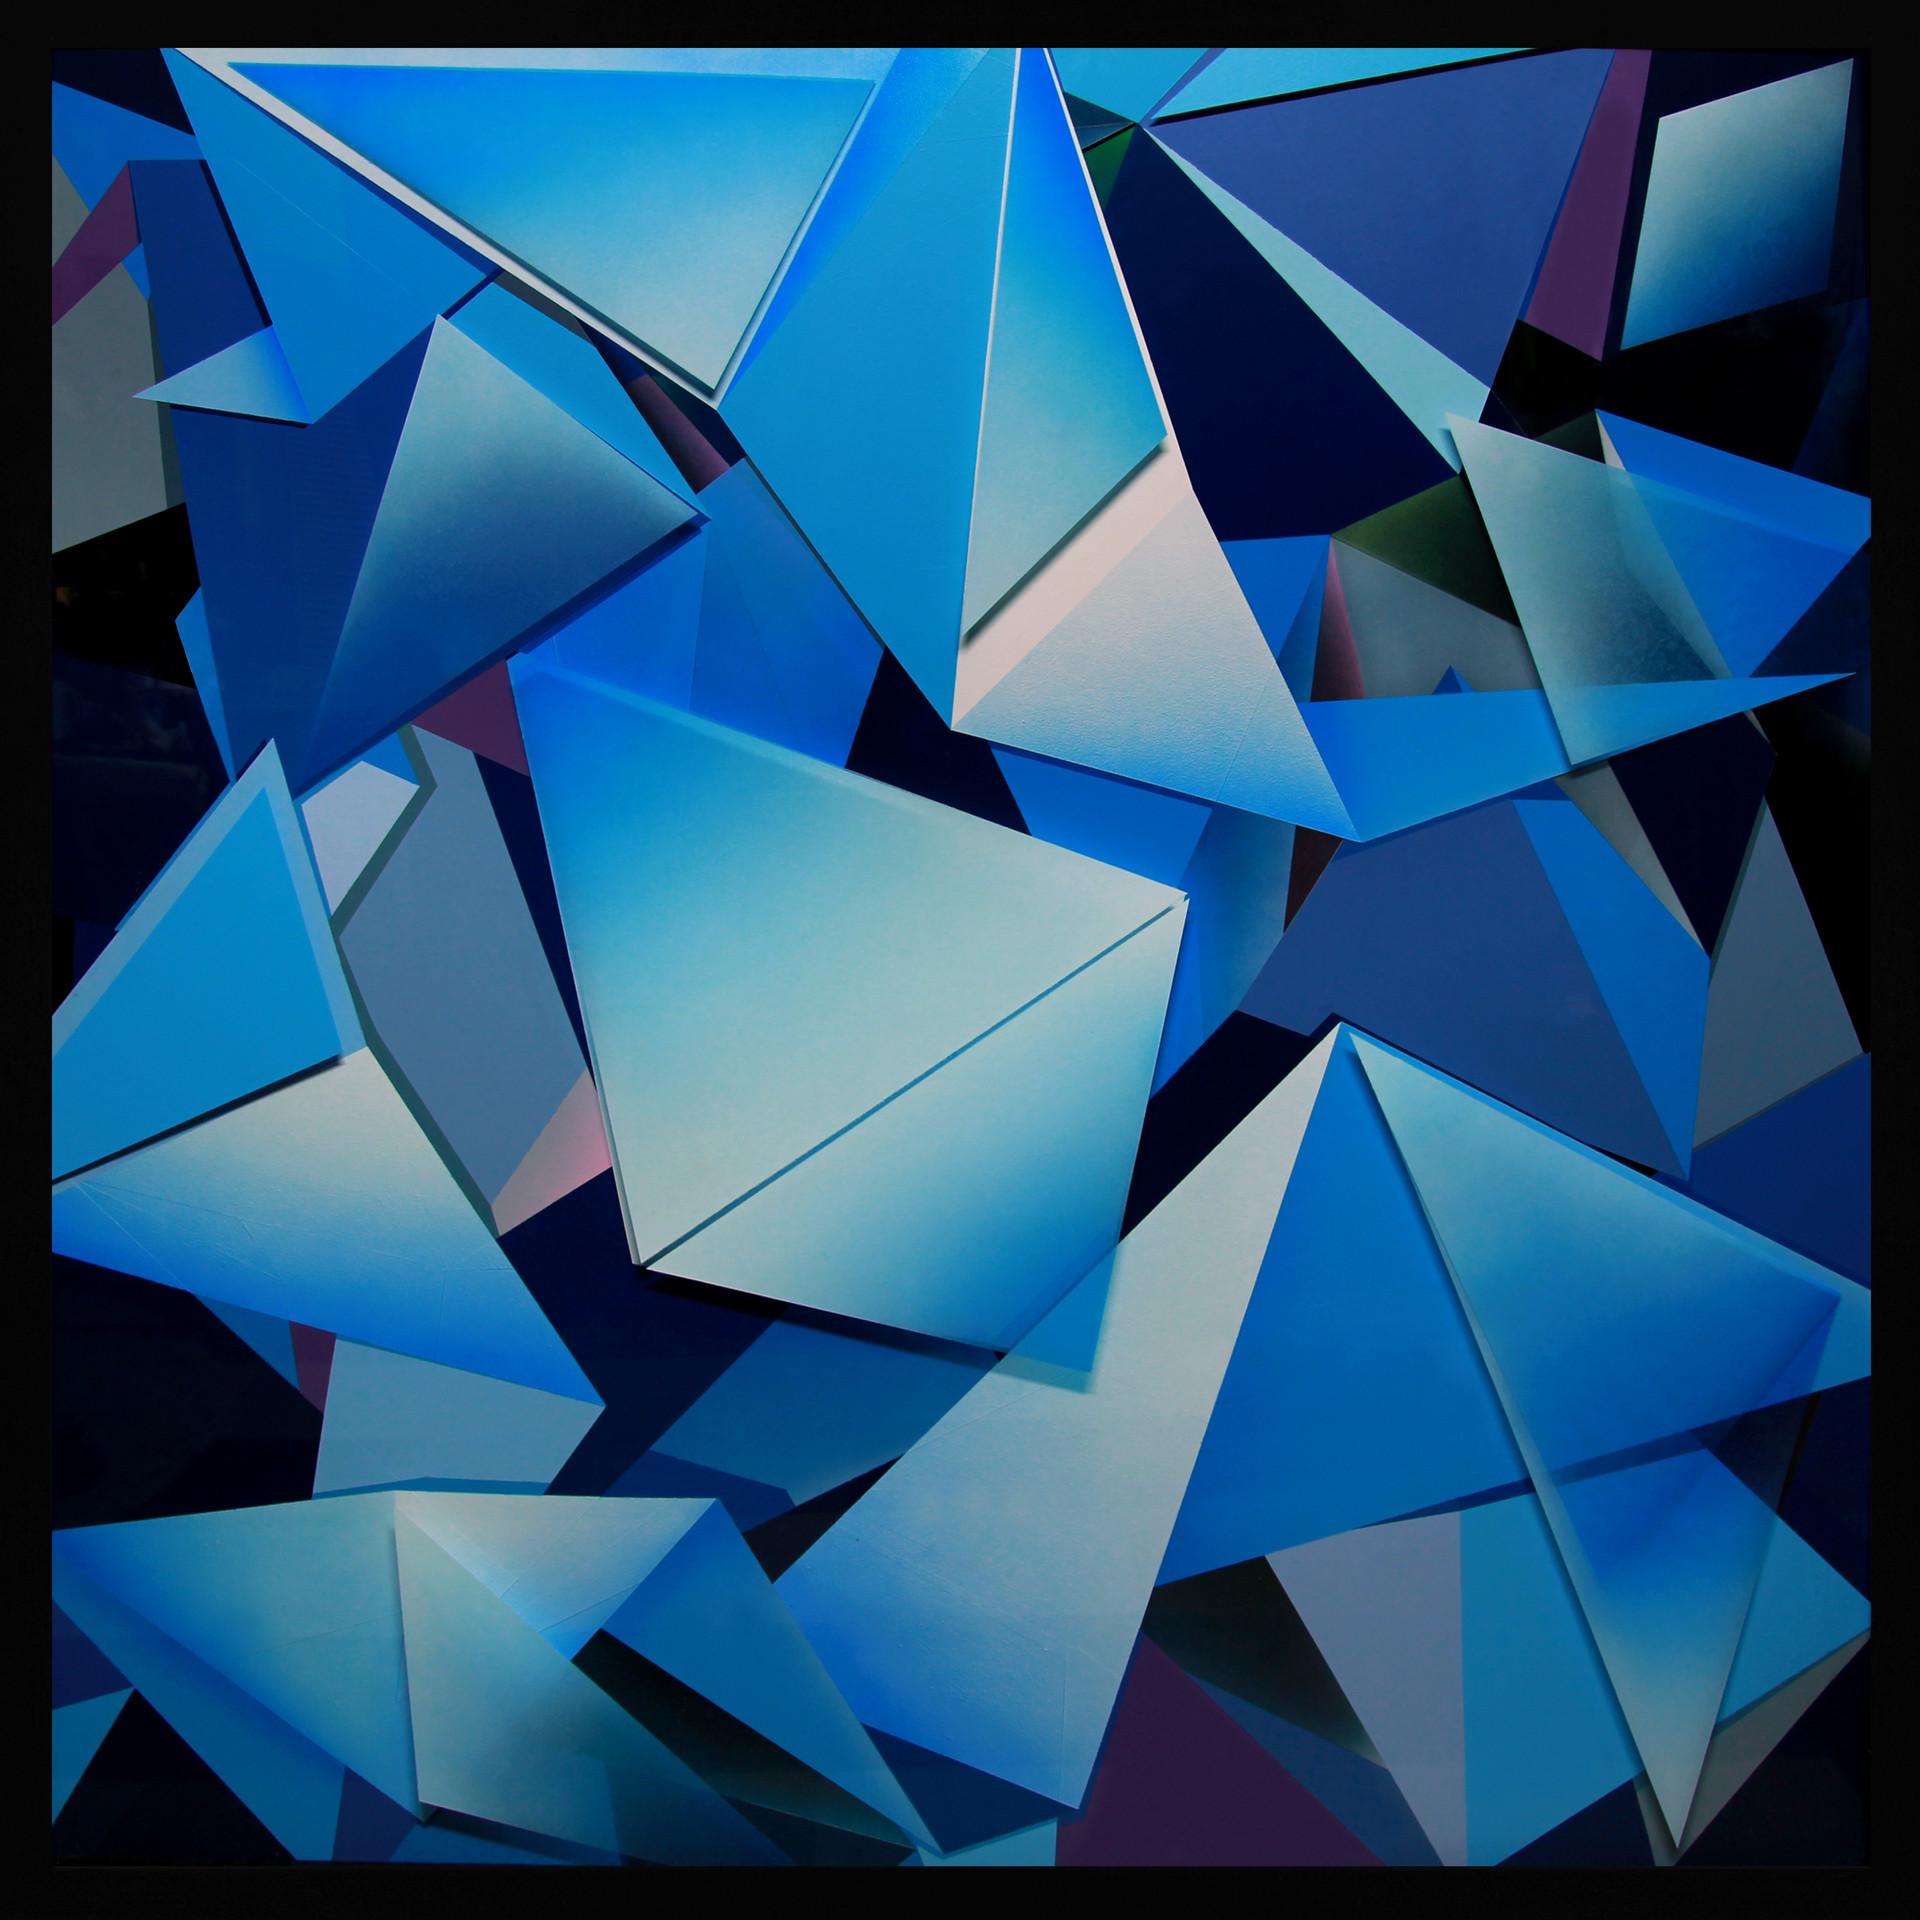 zac koukoravas-Out of the Blue-2017-acrylic and enamel paint on acrylic-153x153cm.